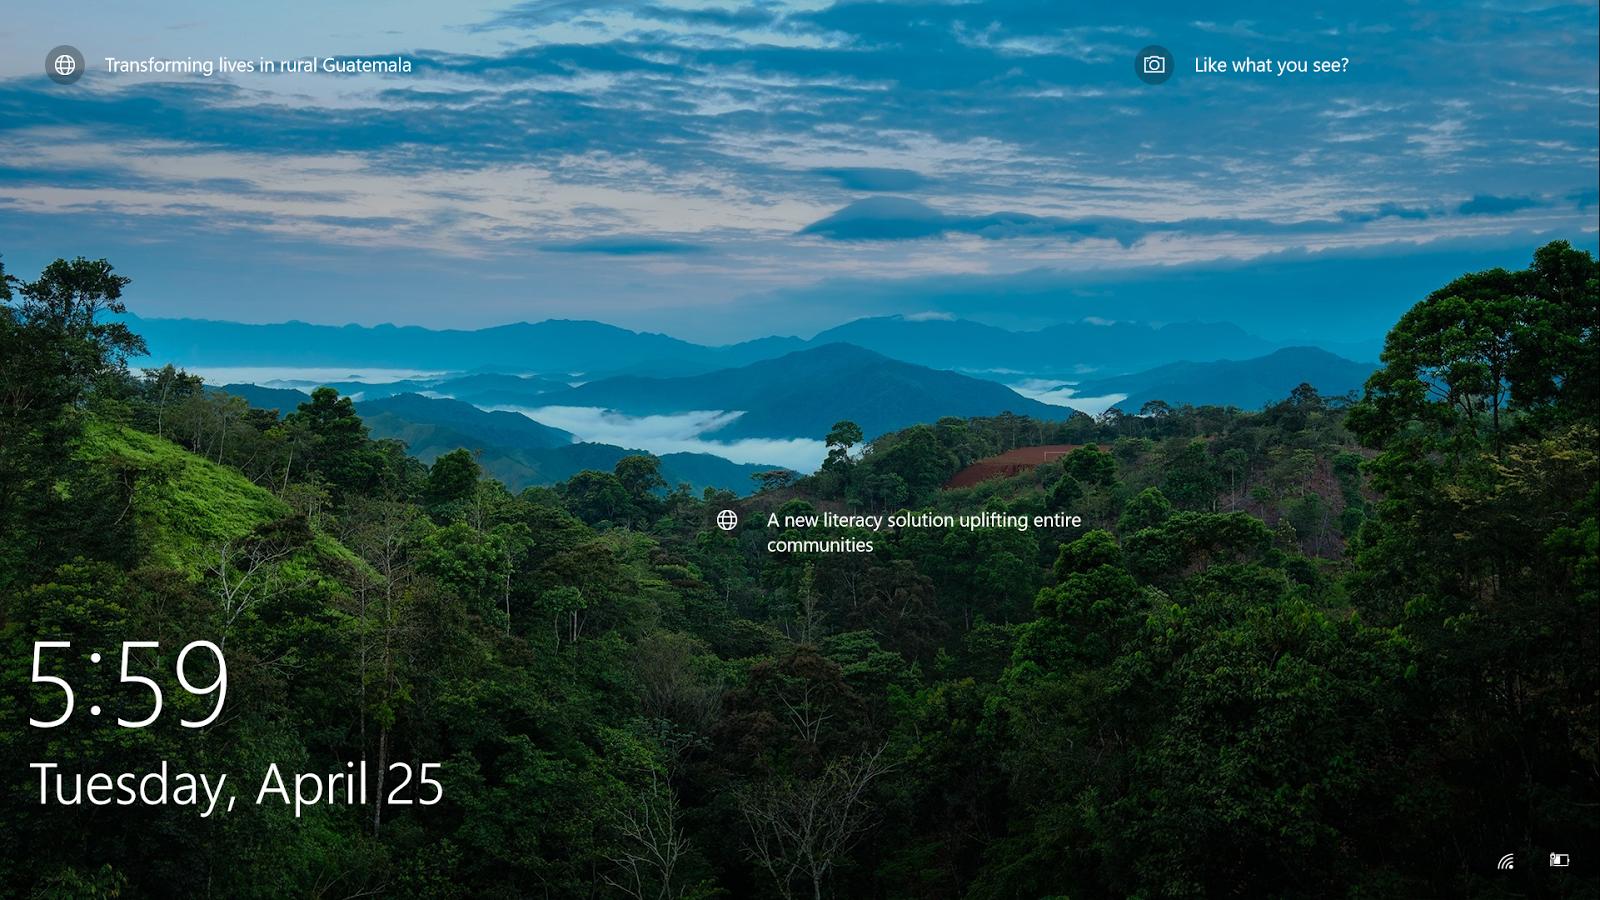 Fantastic Wallpaper Mountain Lock Screen - Colorful_Windows10_Lock_Screen_Screensavers_with_date_and_writings%2B%25282%2529  Image_169663.png